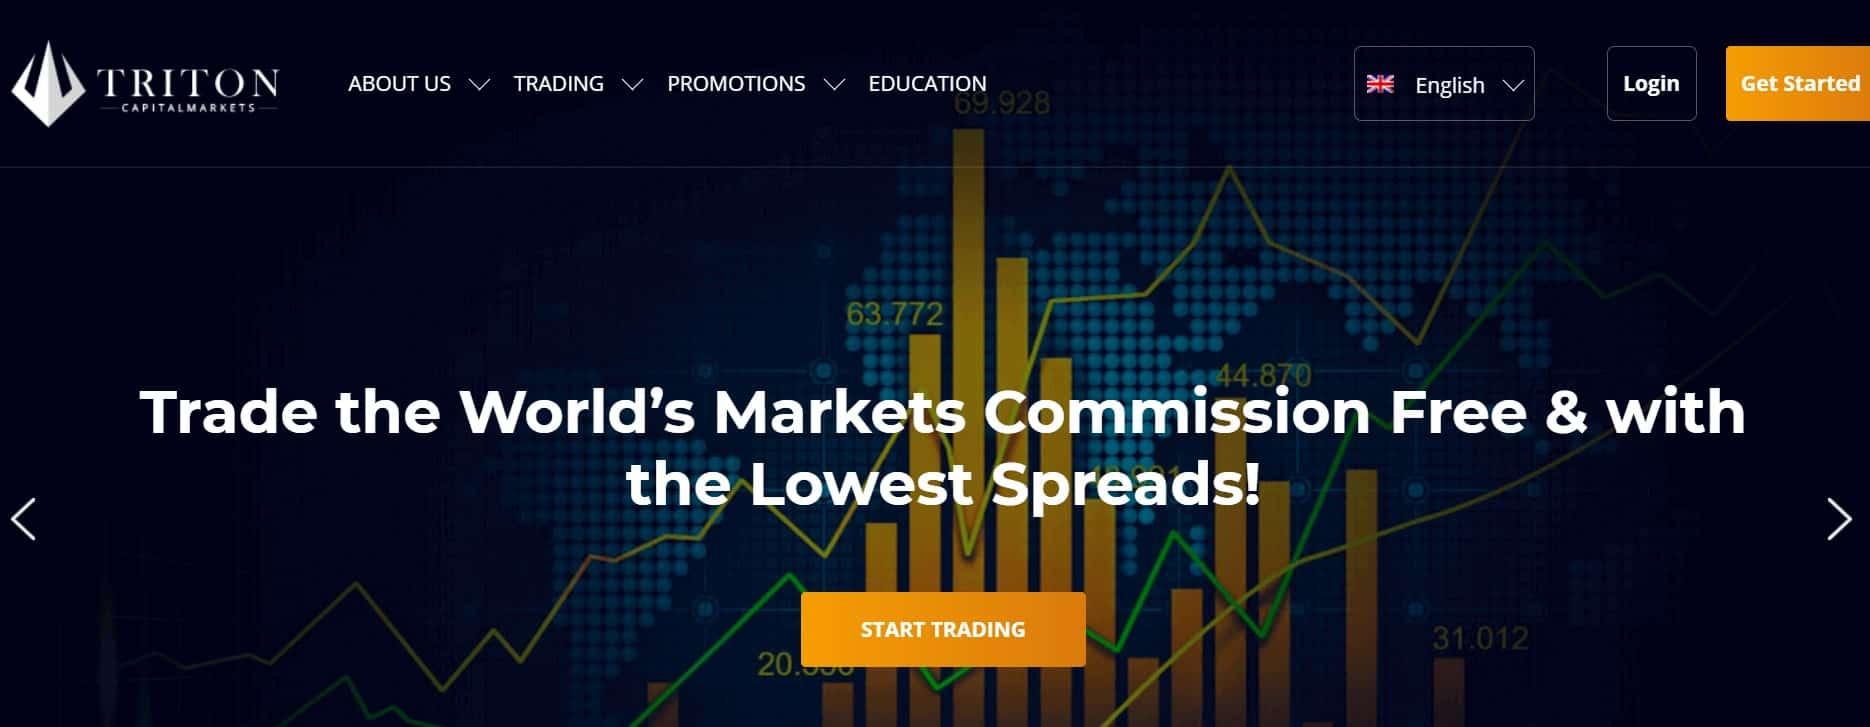 Triton Capitalmarkets website